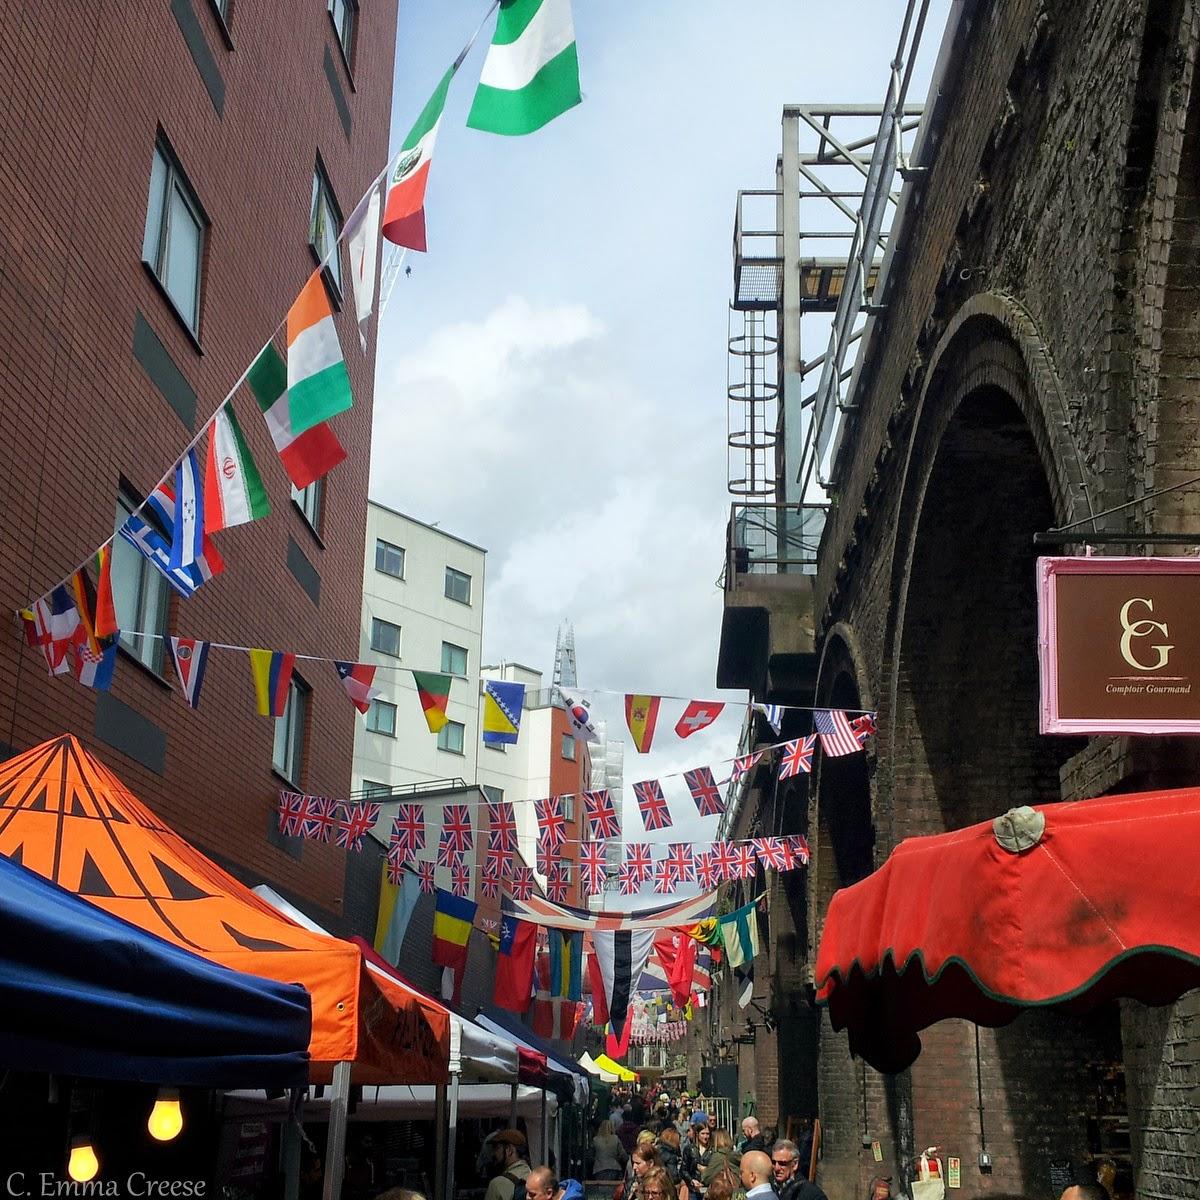 Maltby-Street-Market: London's-best-kept-secret-Adventures-of-a-London-Kiwi